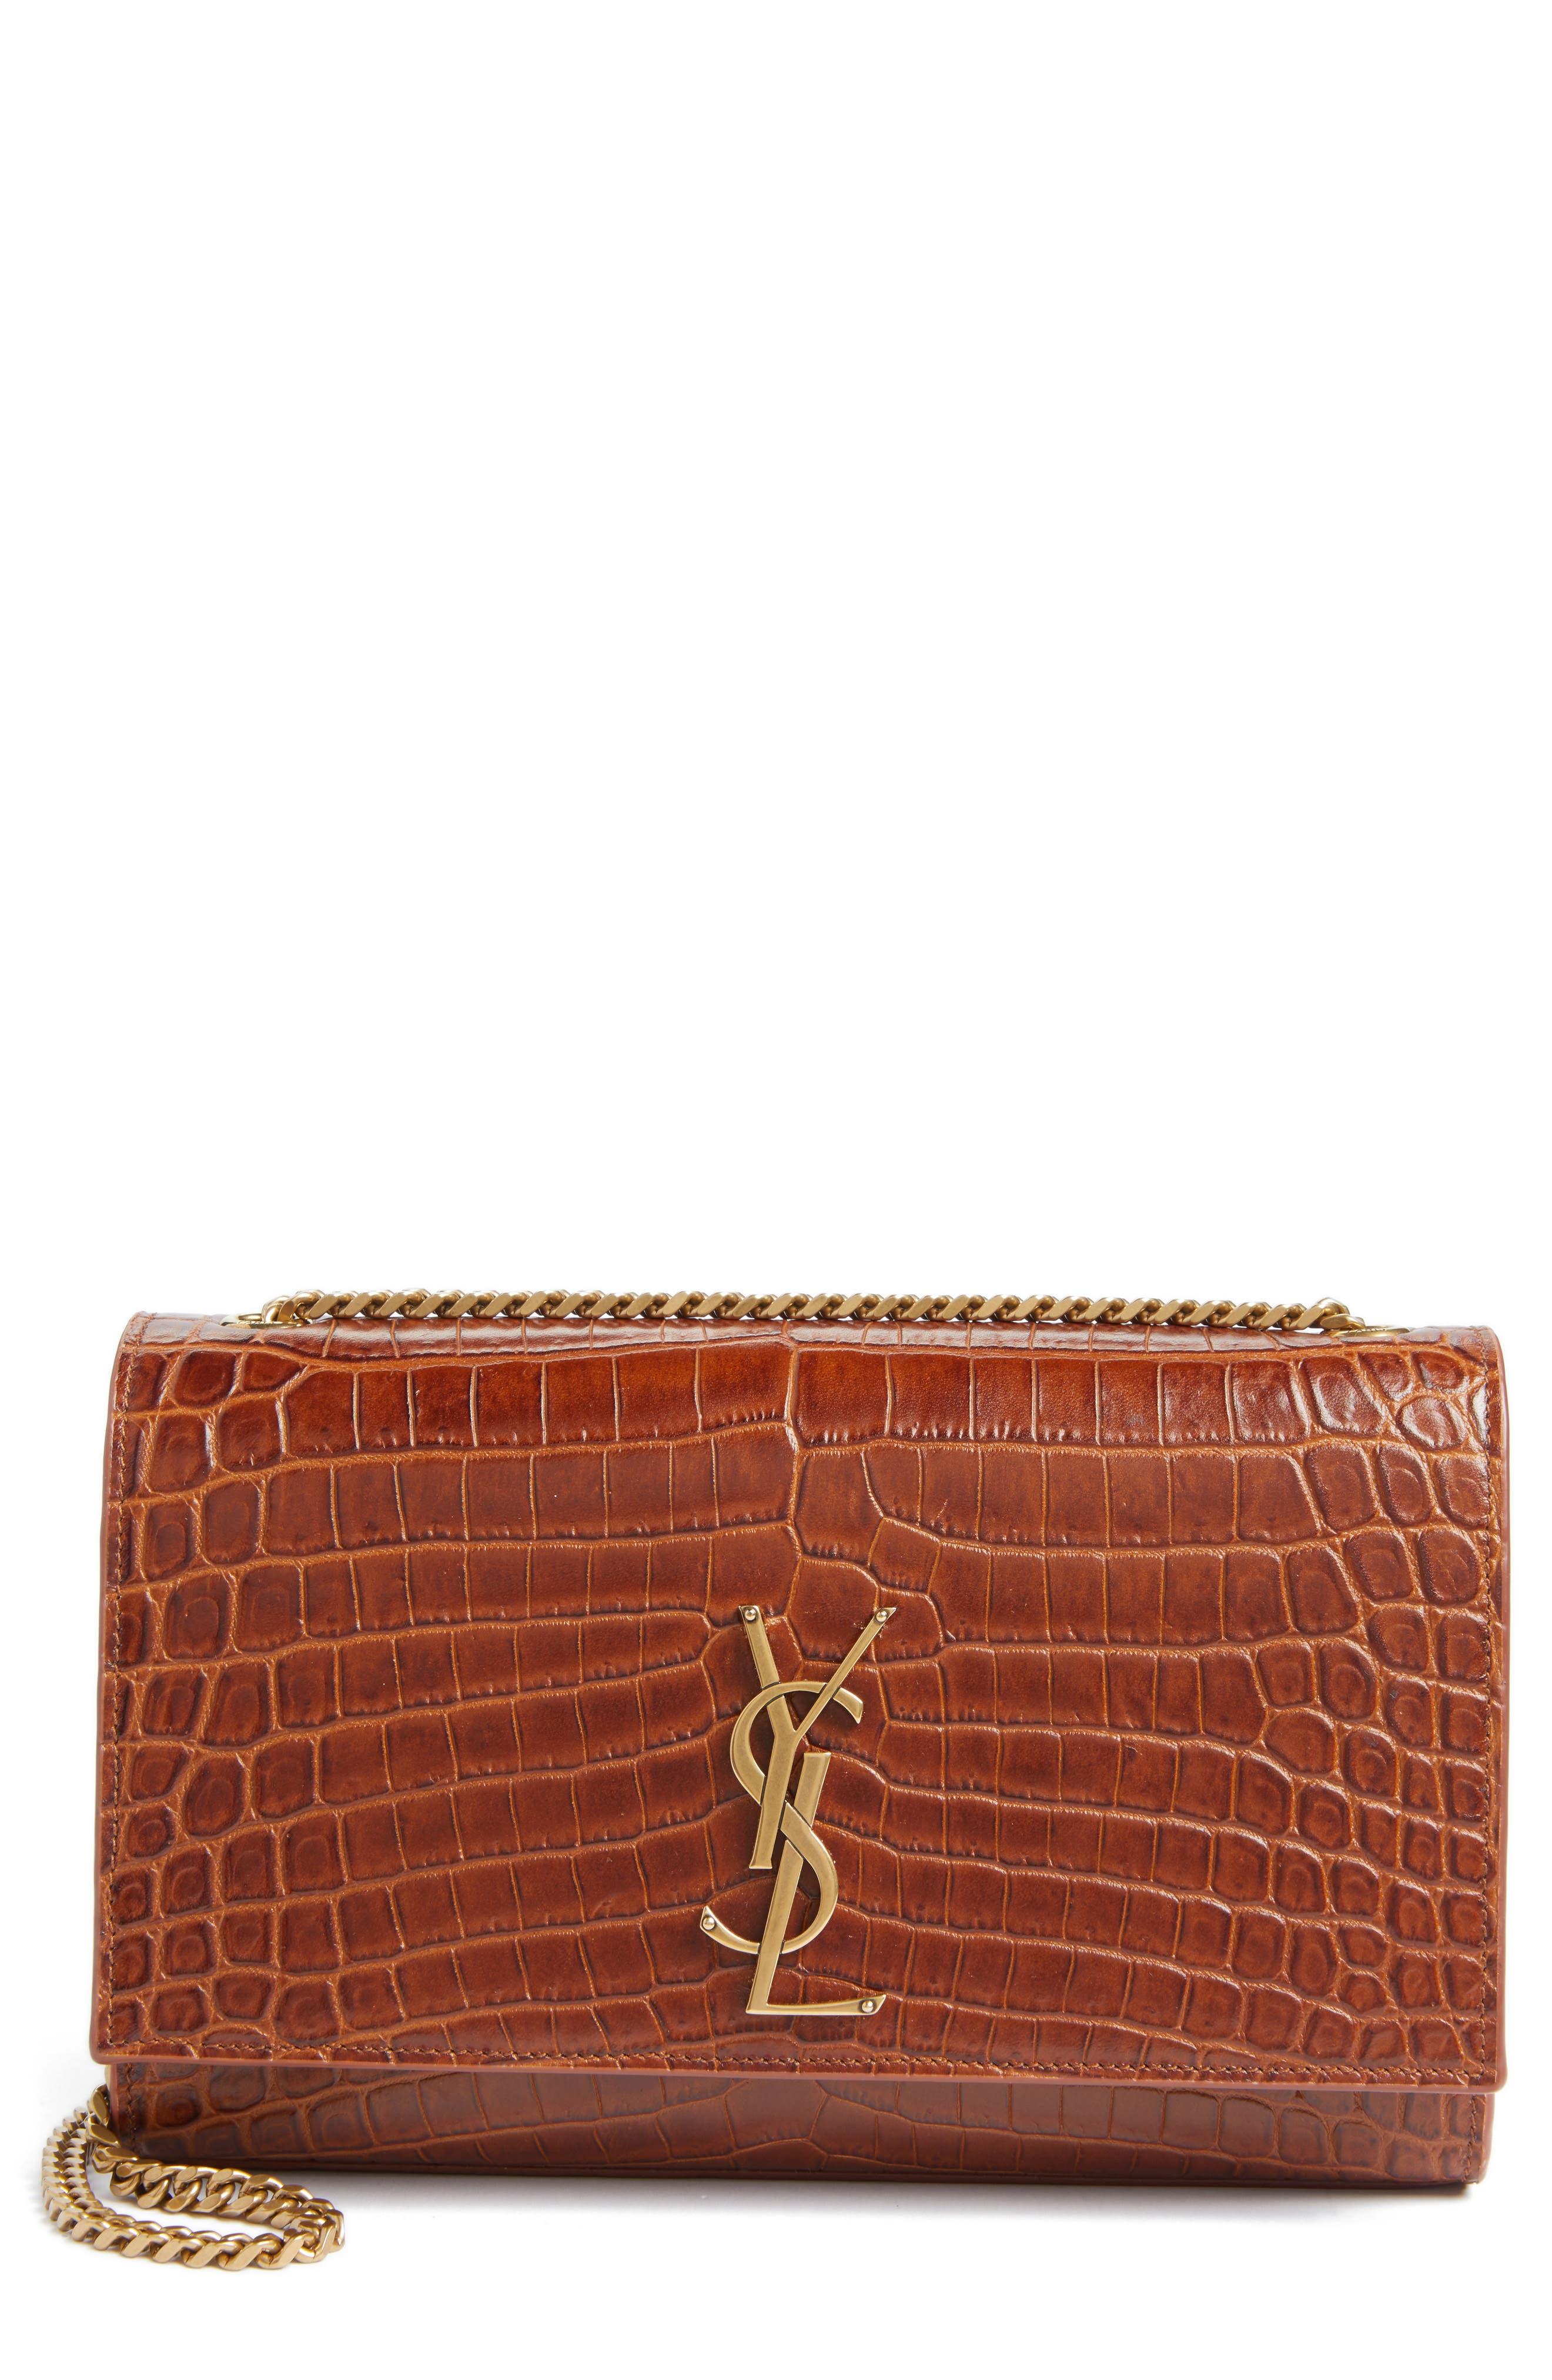 Alternate Image 1 Selected - Saint Laurent Medium Kate Croc Embossed Leather Shoulder Bag